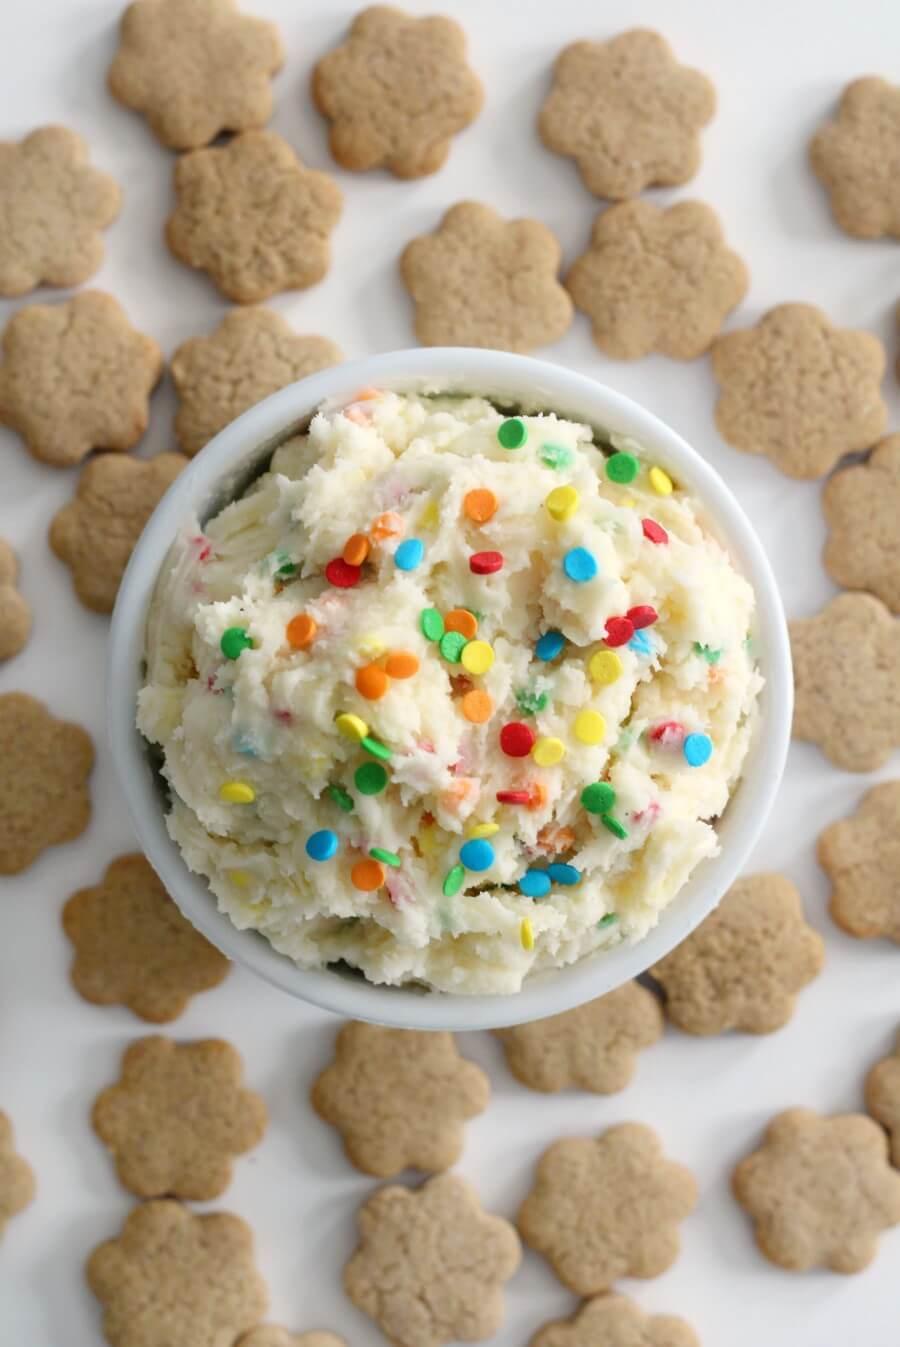 overhead view of vegan Dunkaroo dip with gluten-free cookies on table